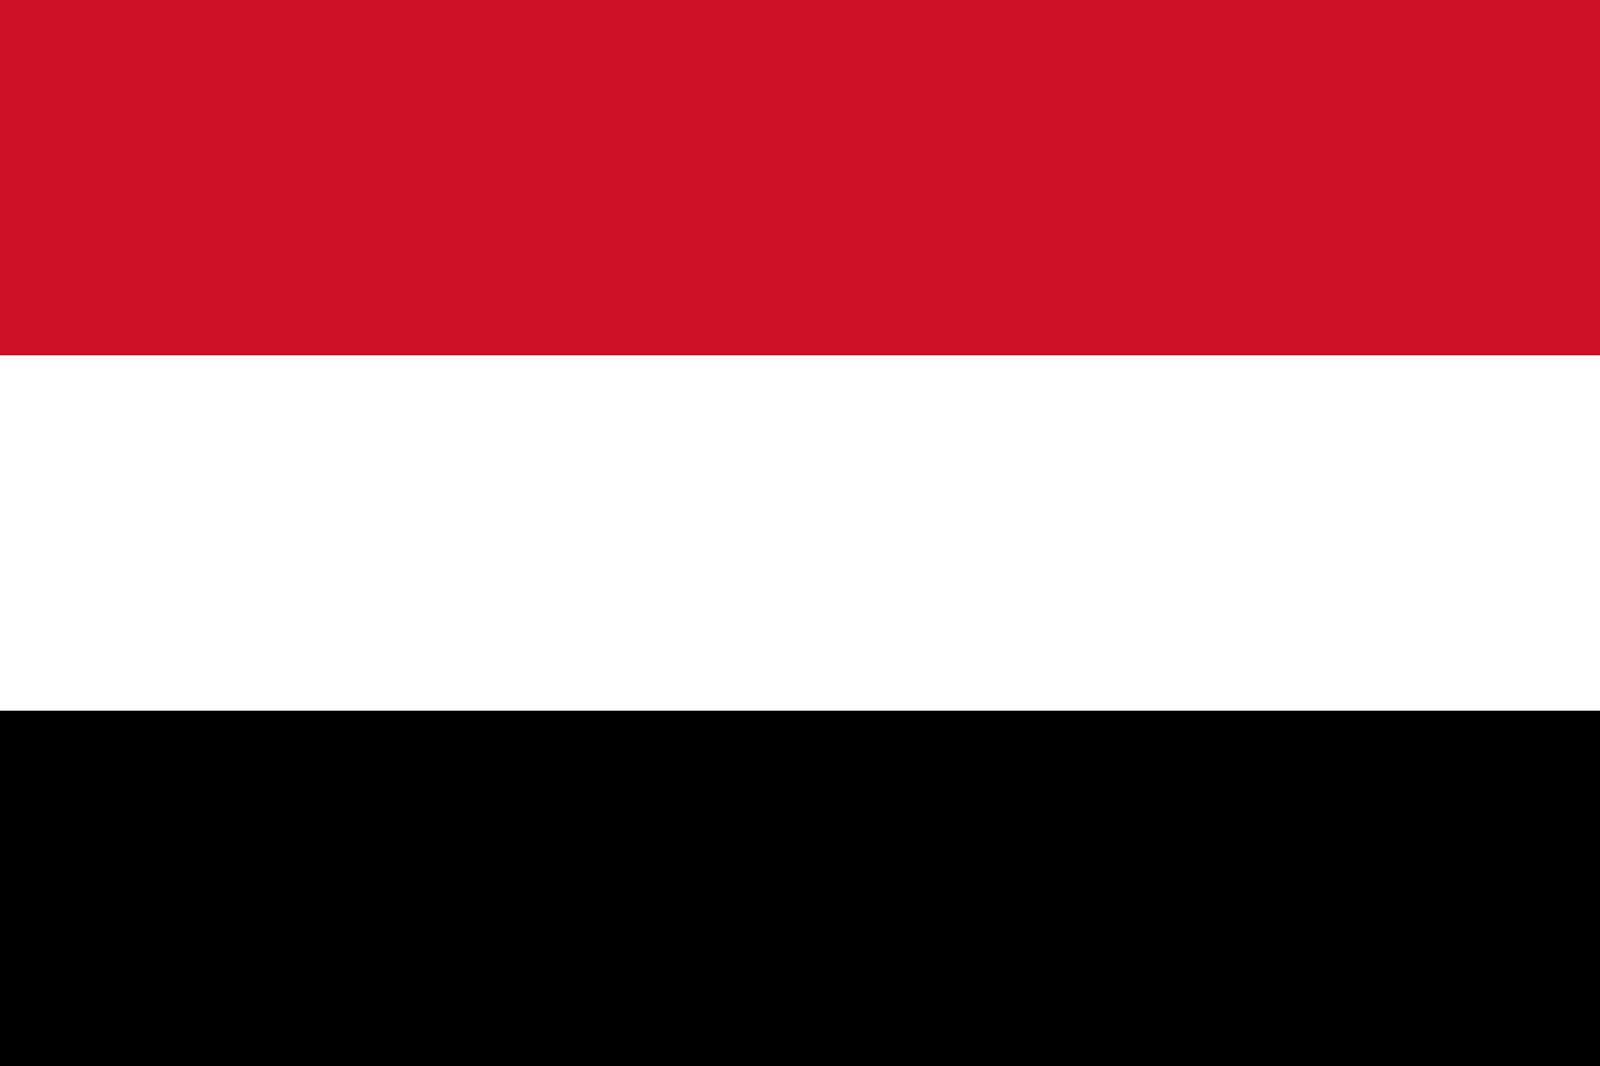 Yemen Flag HD Wallpaper Background